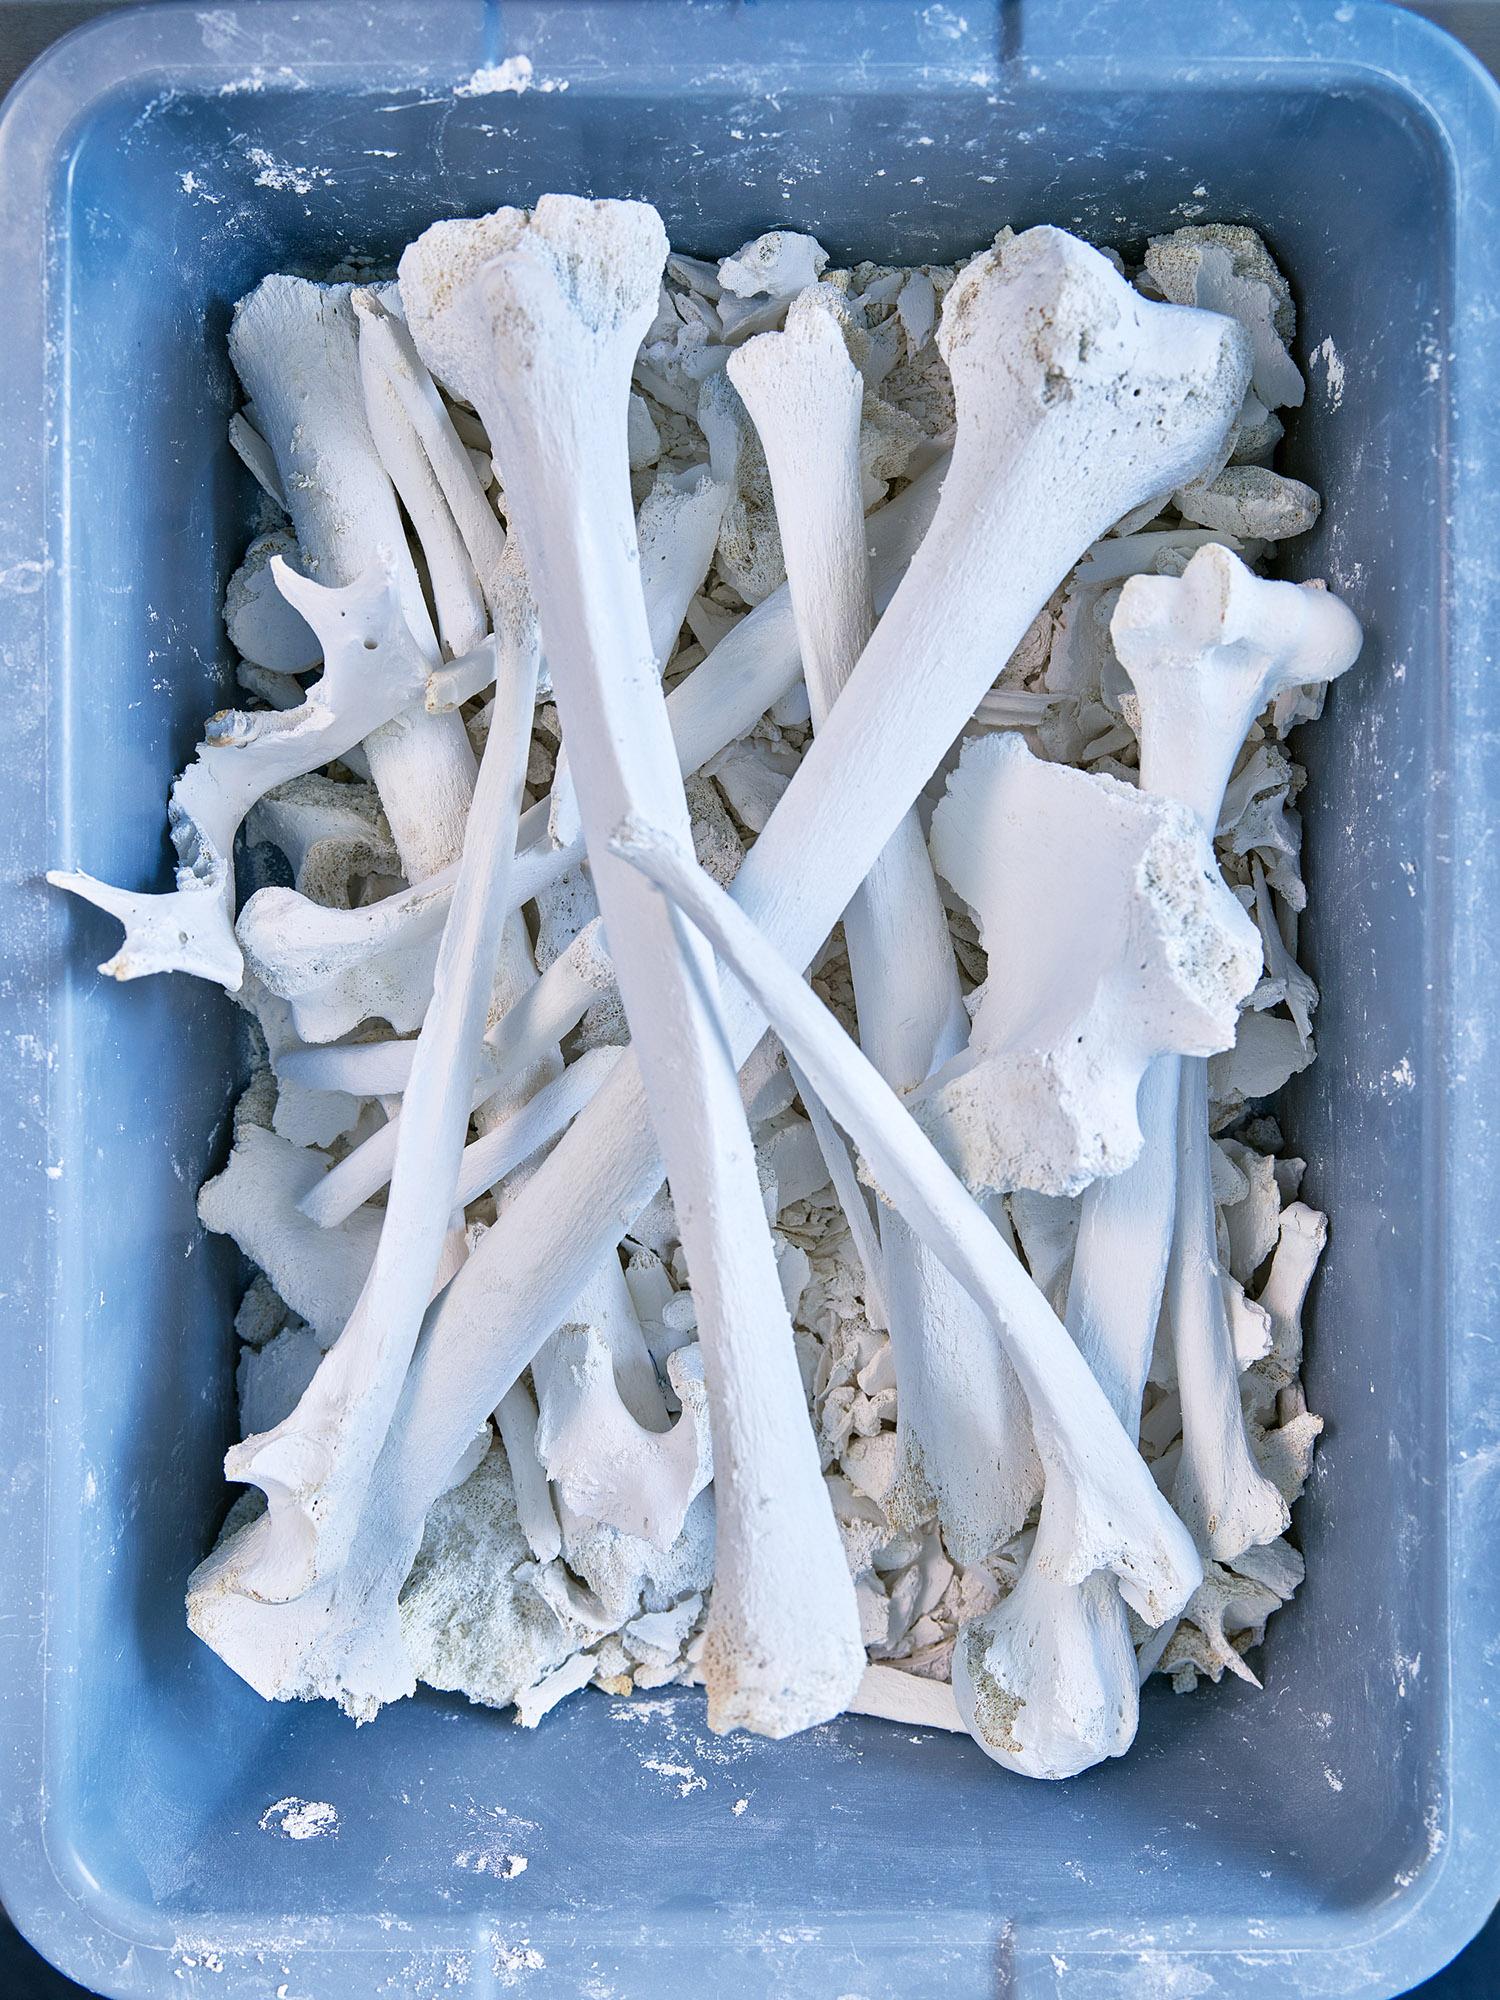 Human Bones Processed by Alkaline Hydrolysis, UCLA, Los Angeles, California, 2017